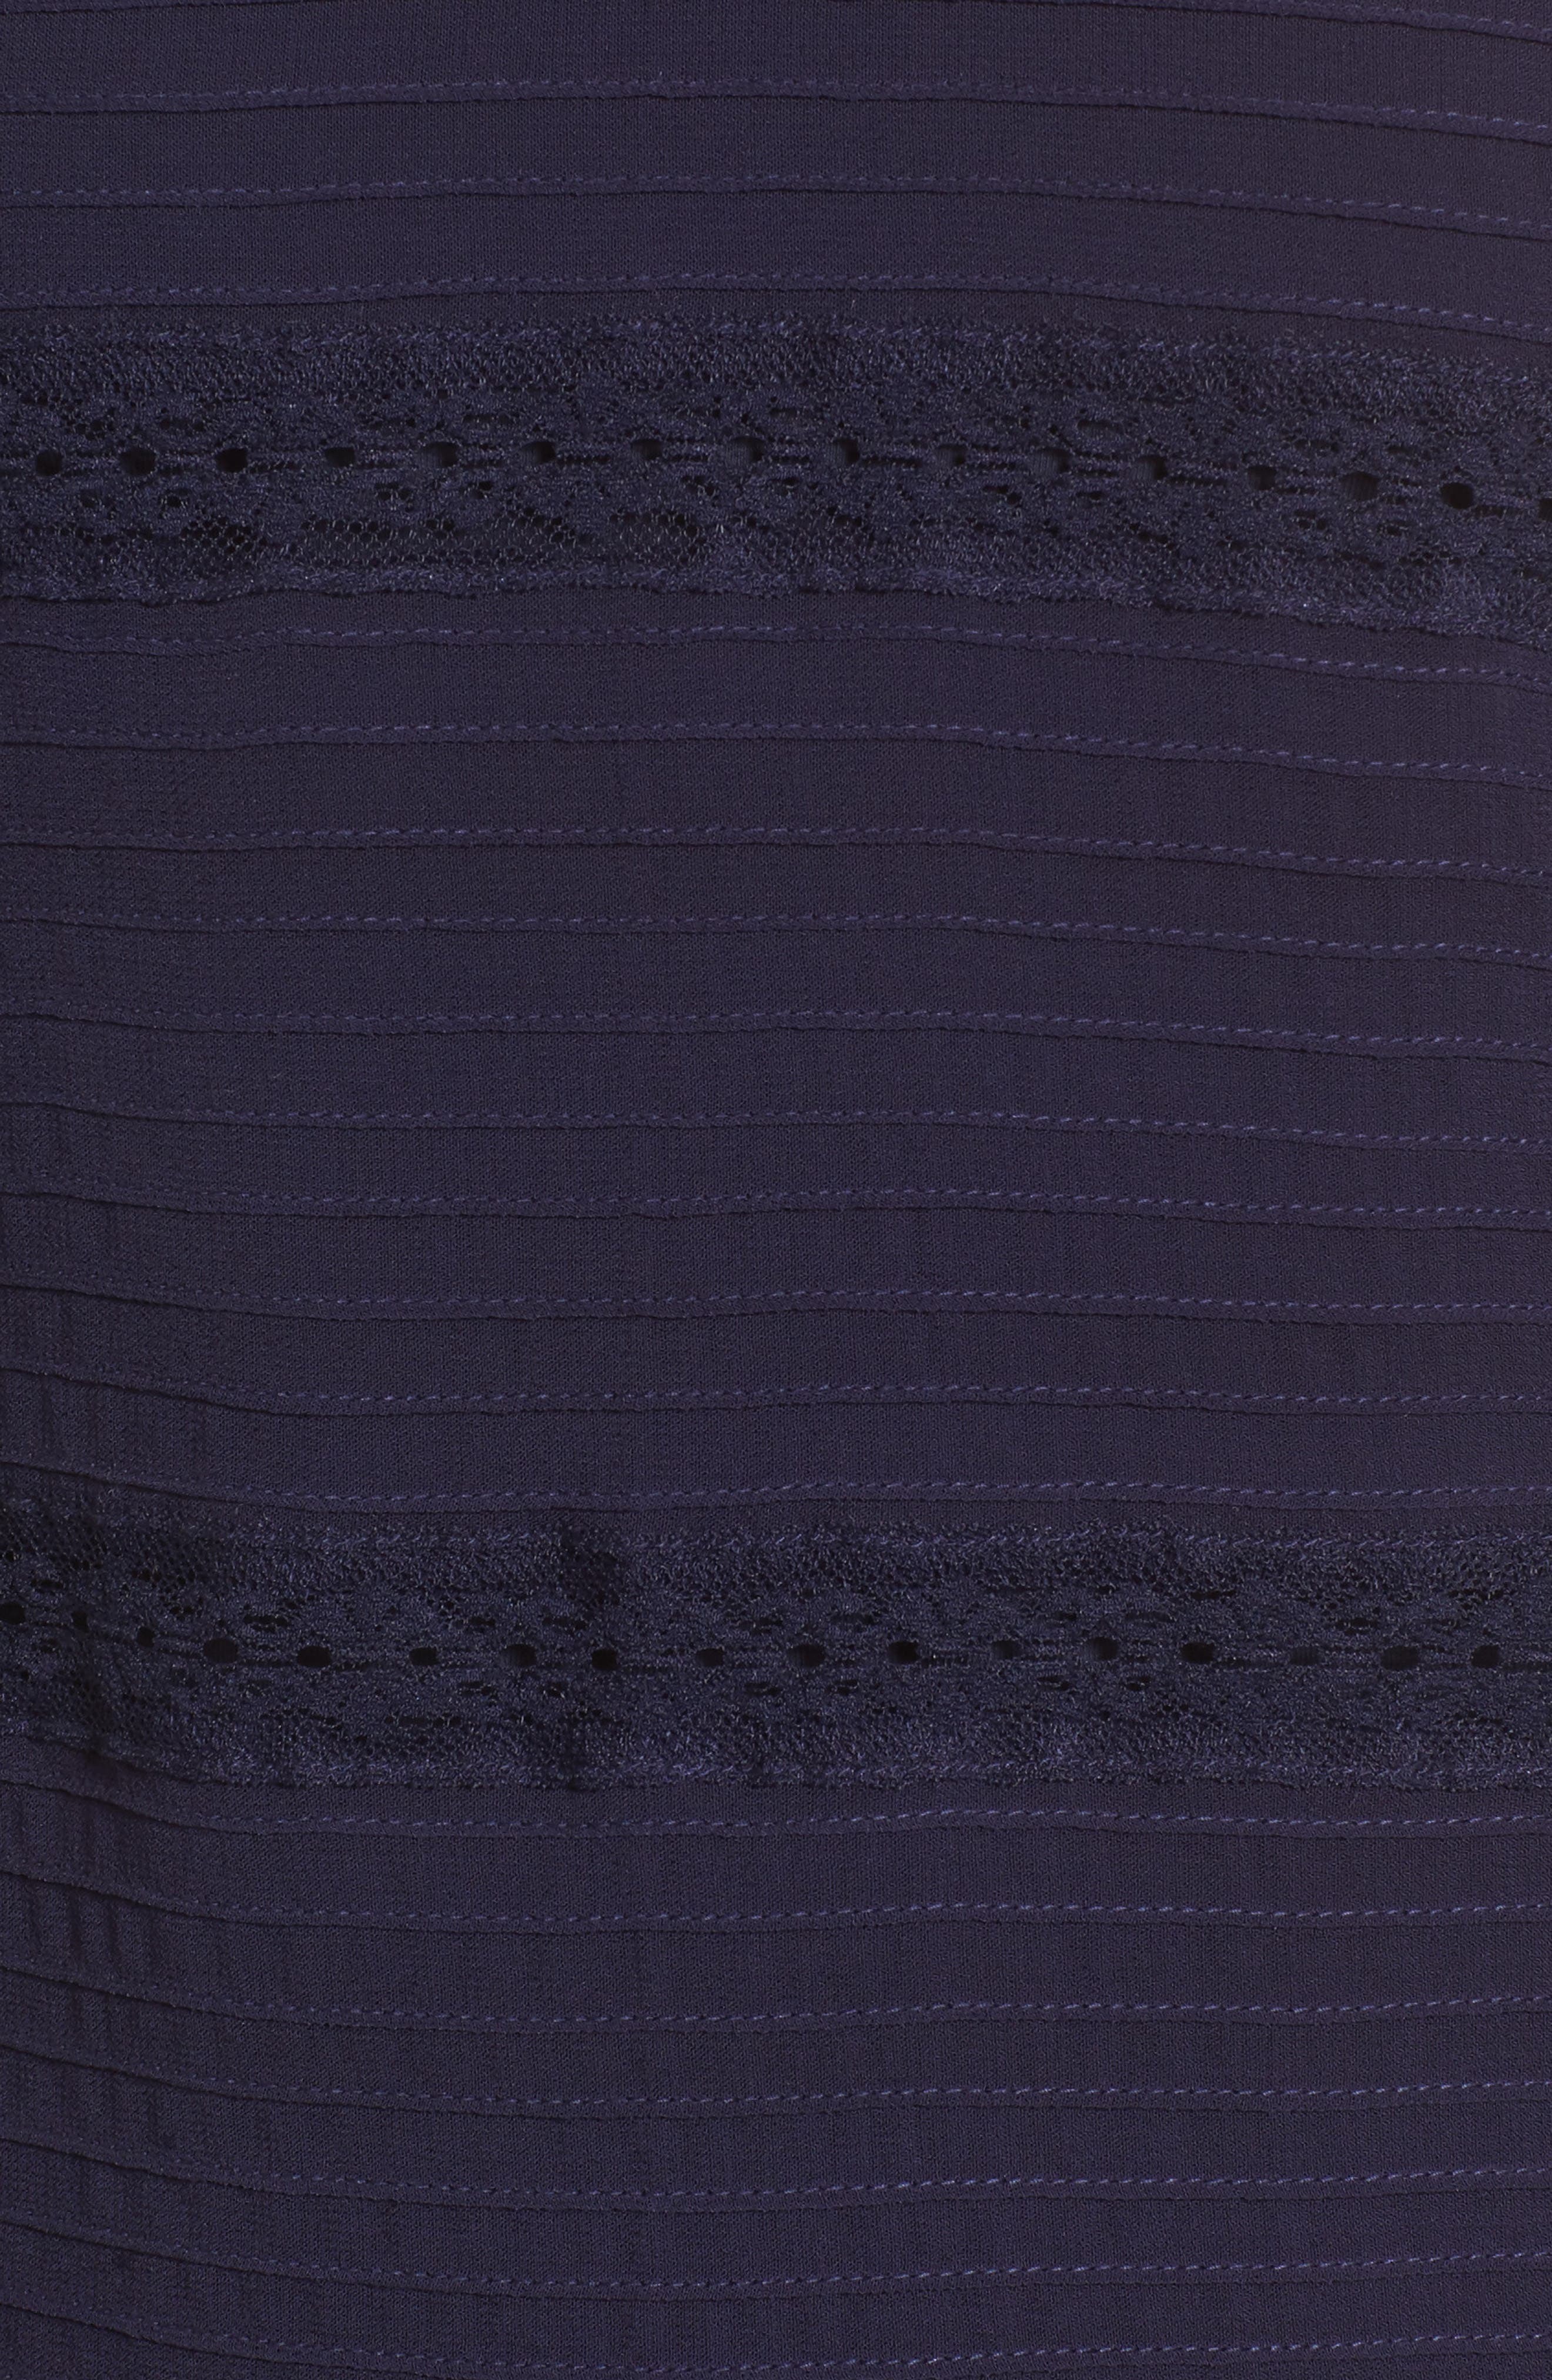 Pintuck & Lace Top,                             Alternate thumbnail 9, color,